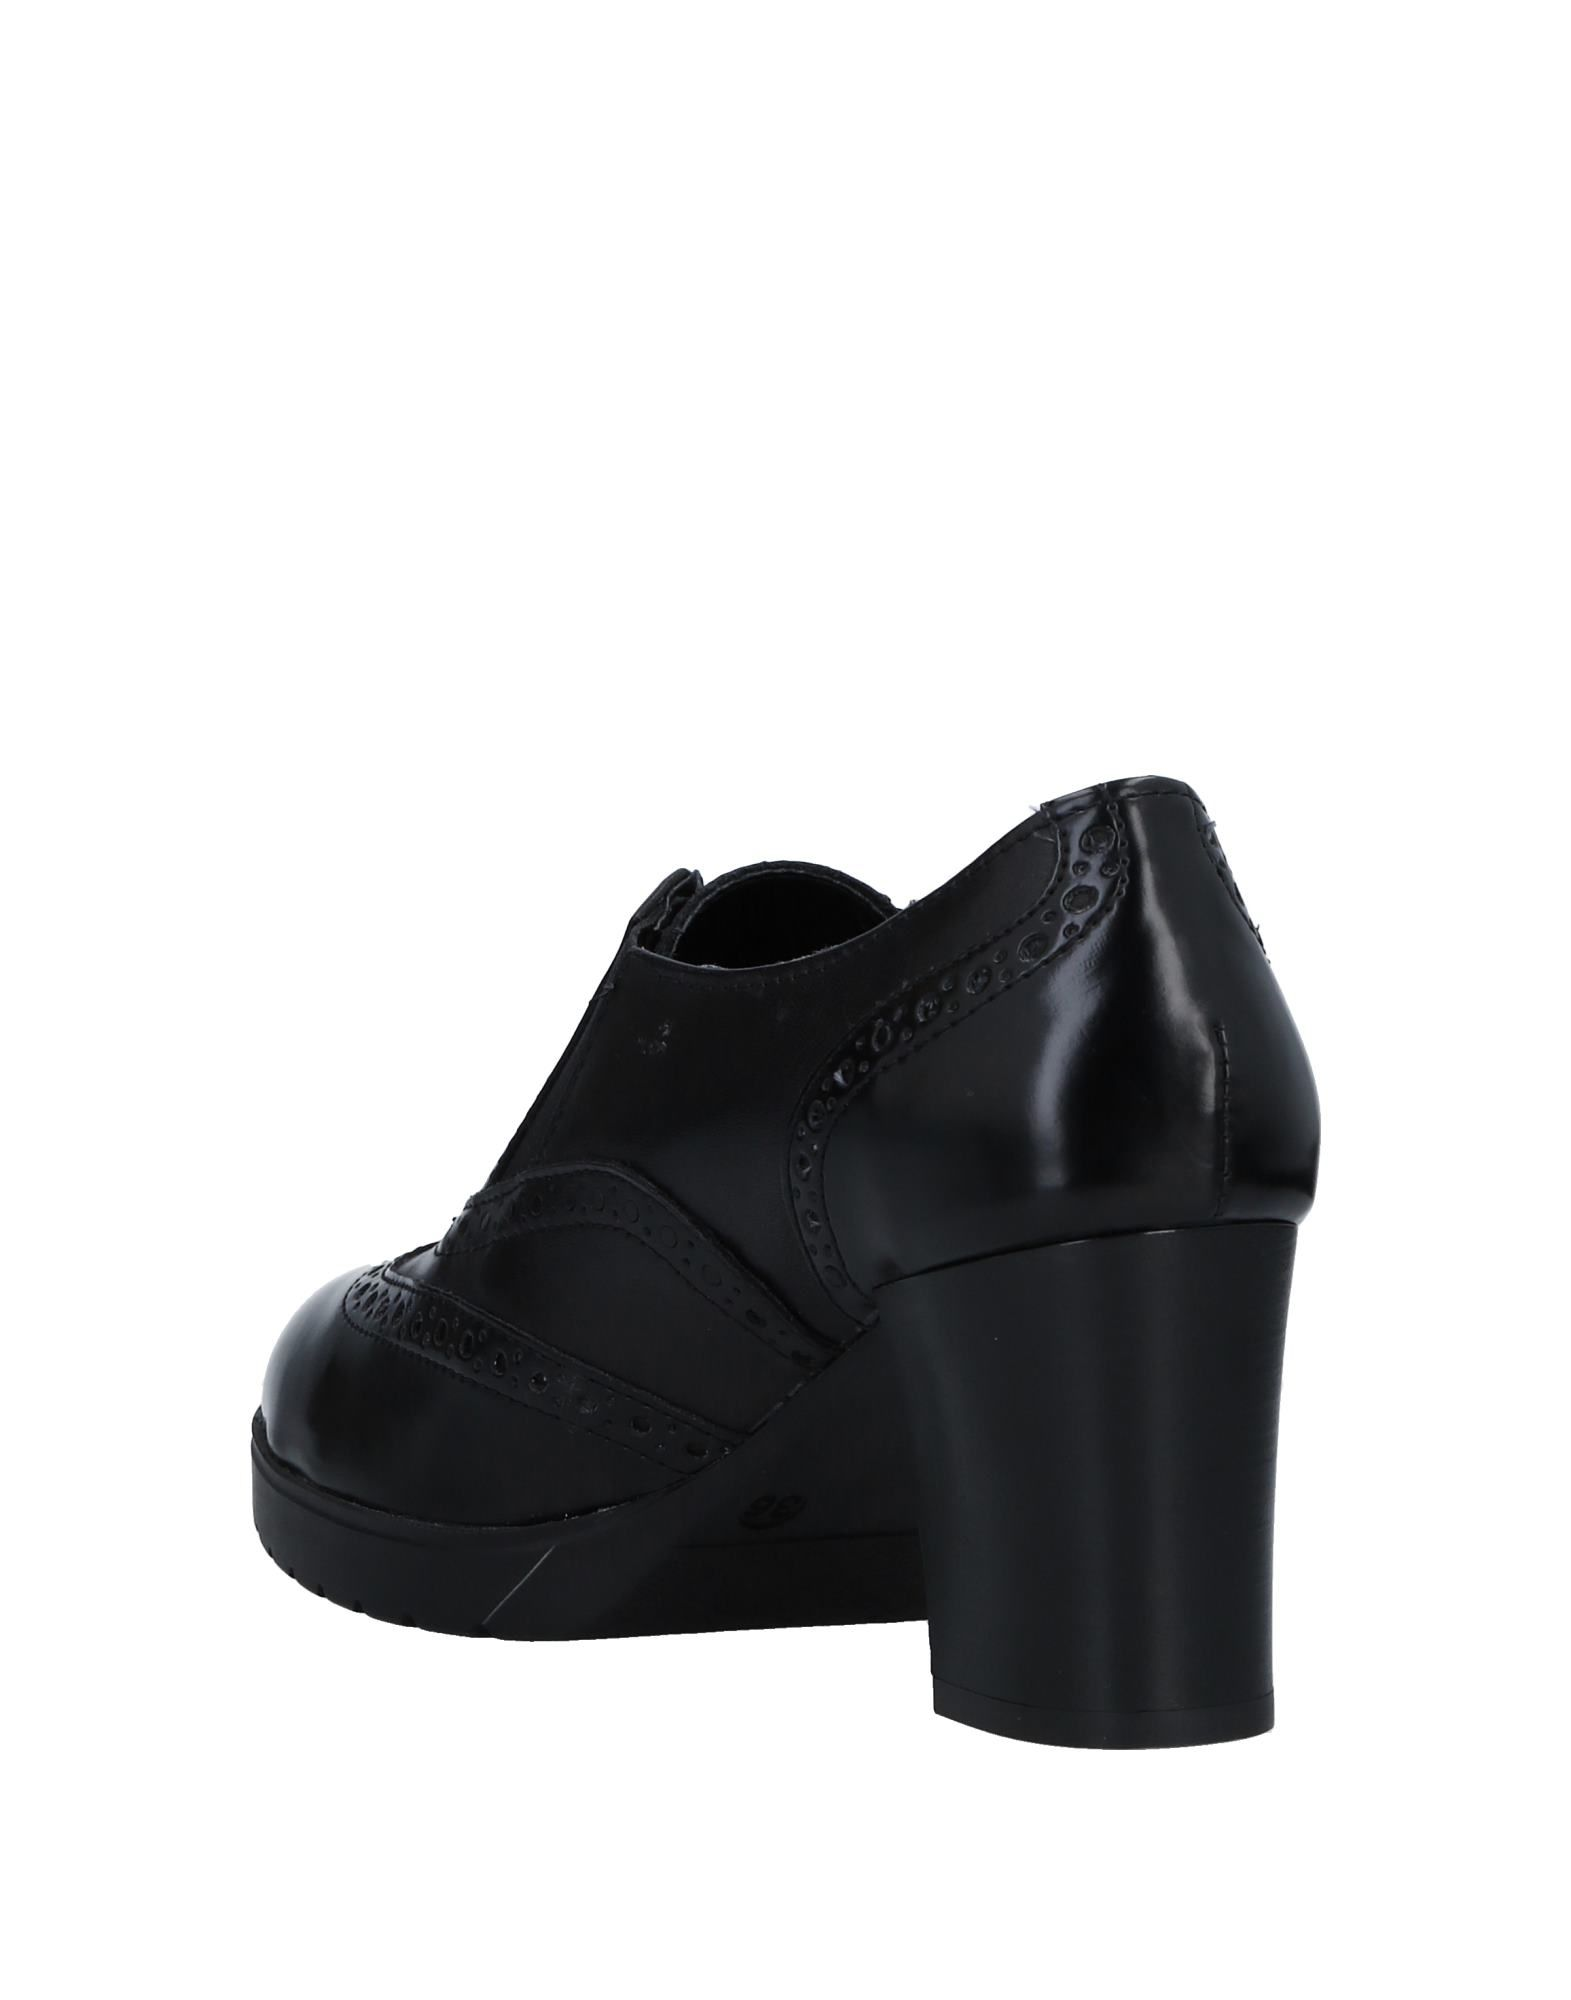 Cinzia Soft By Mauri Moda Gute Schnürschuhe Damen  11534884DC Gute Moda Qualität beliebte Schuhe 2146ed